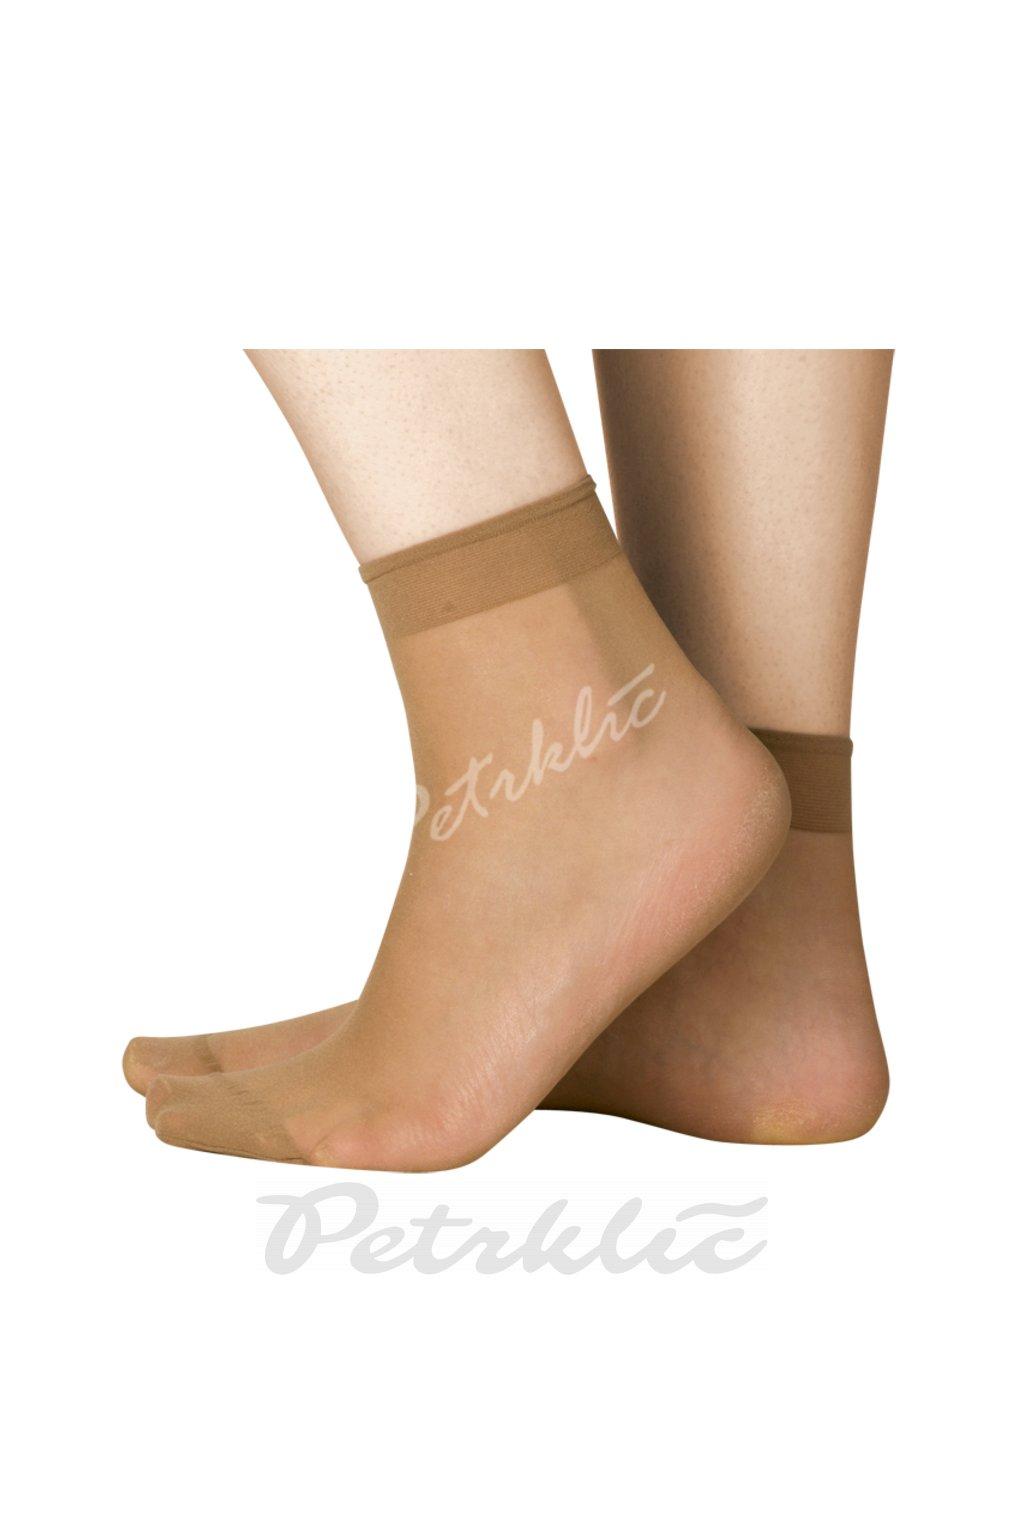 POLONA - ponožky 2 páry